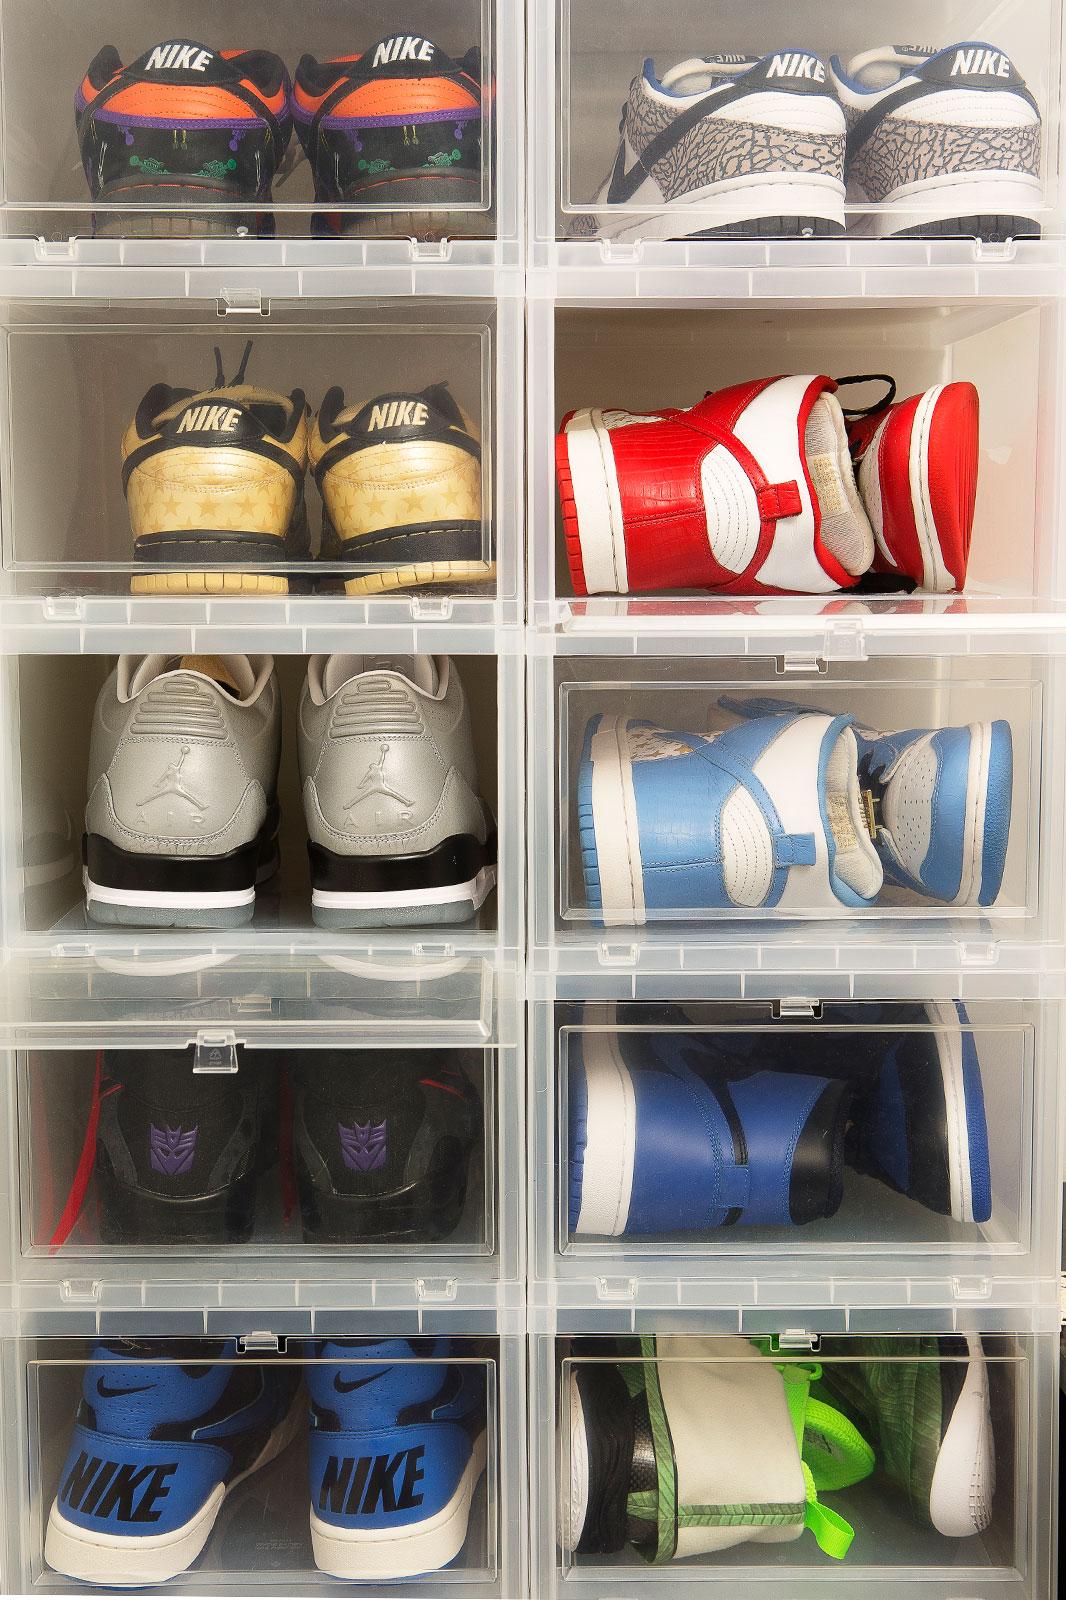 Sneakerhead04